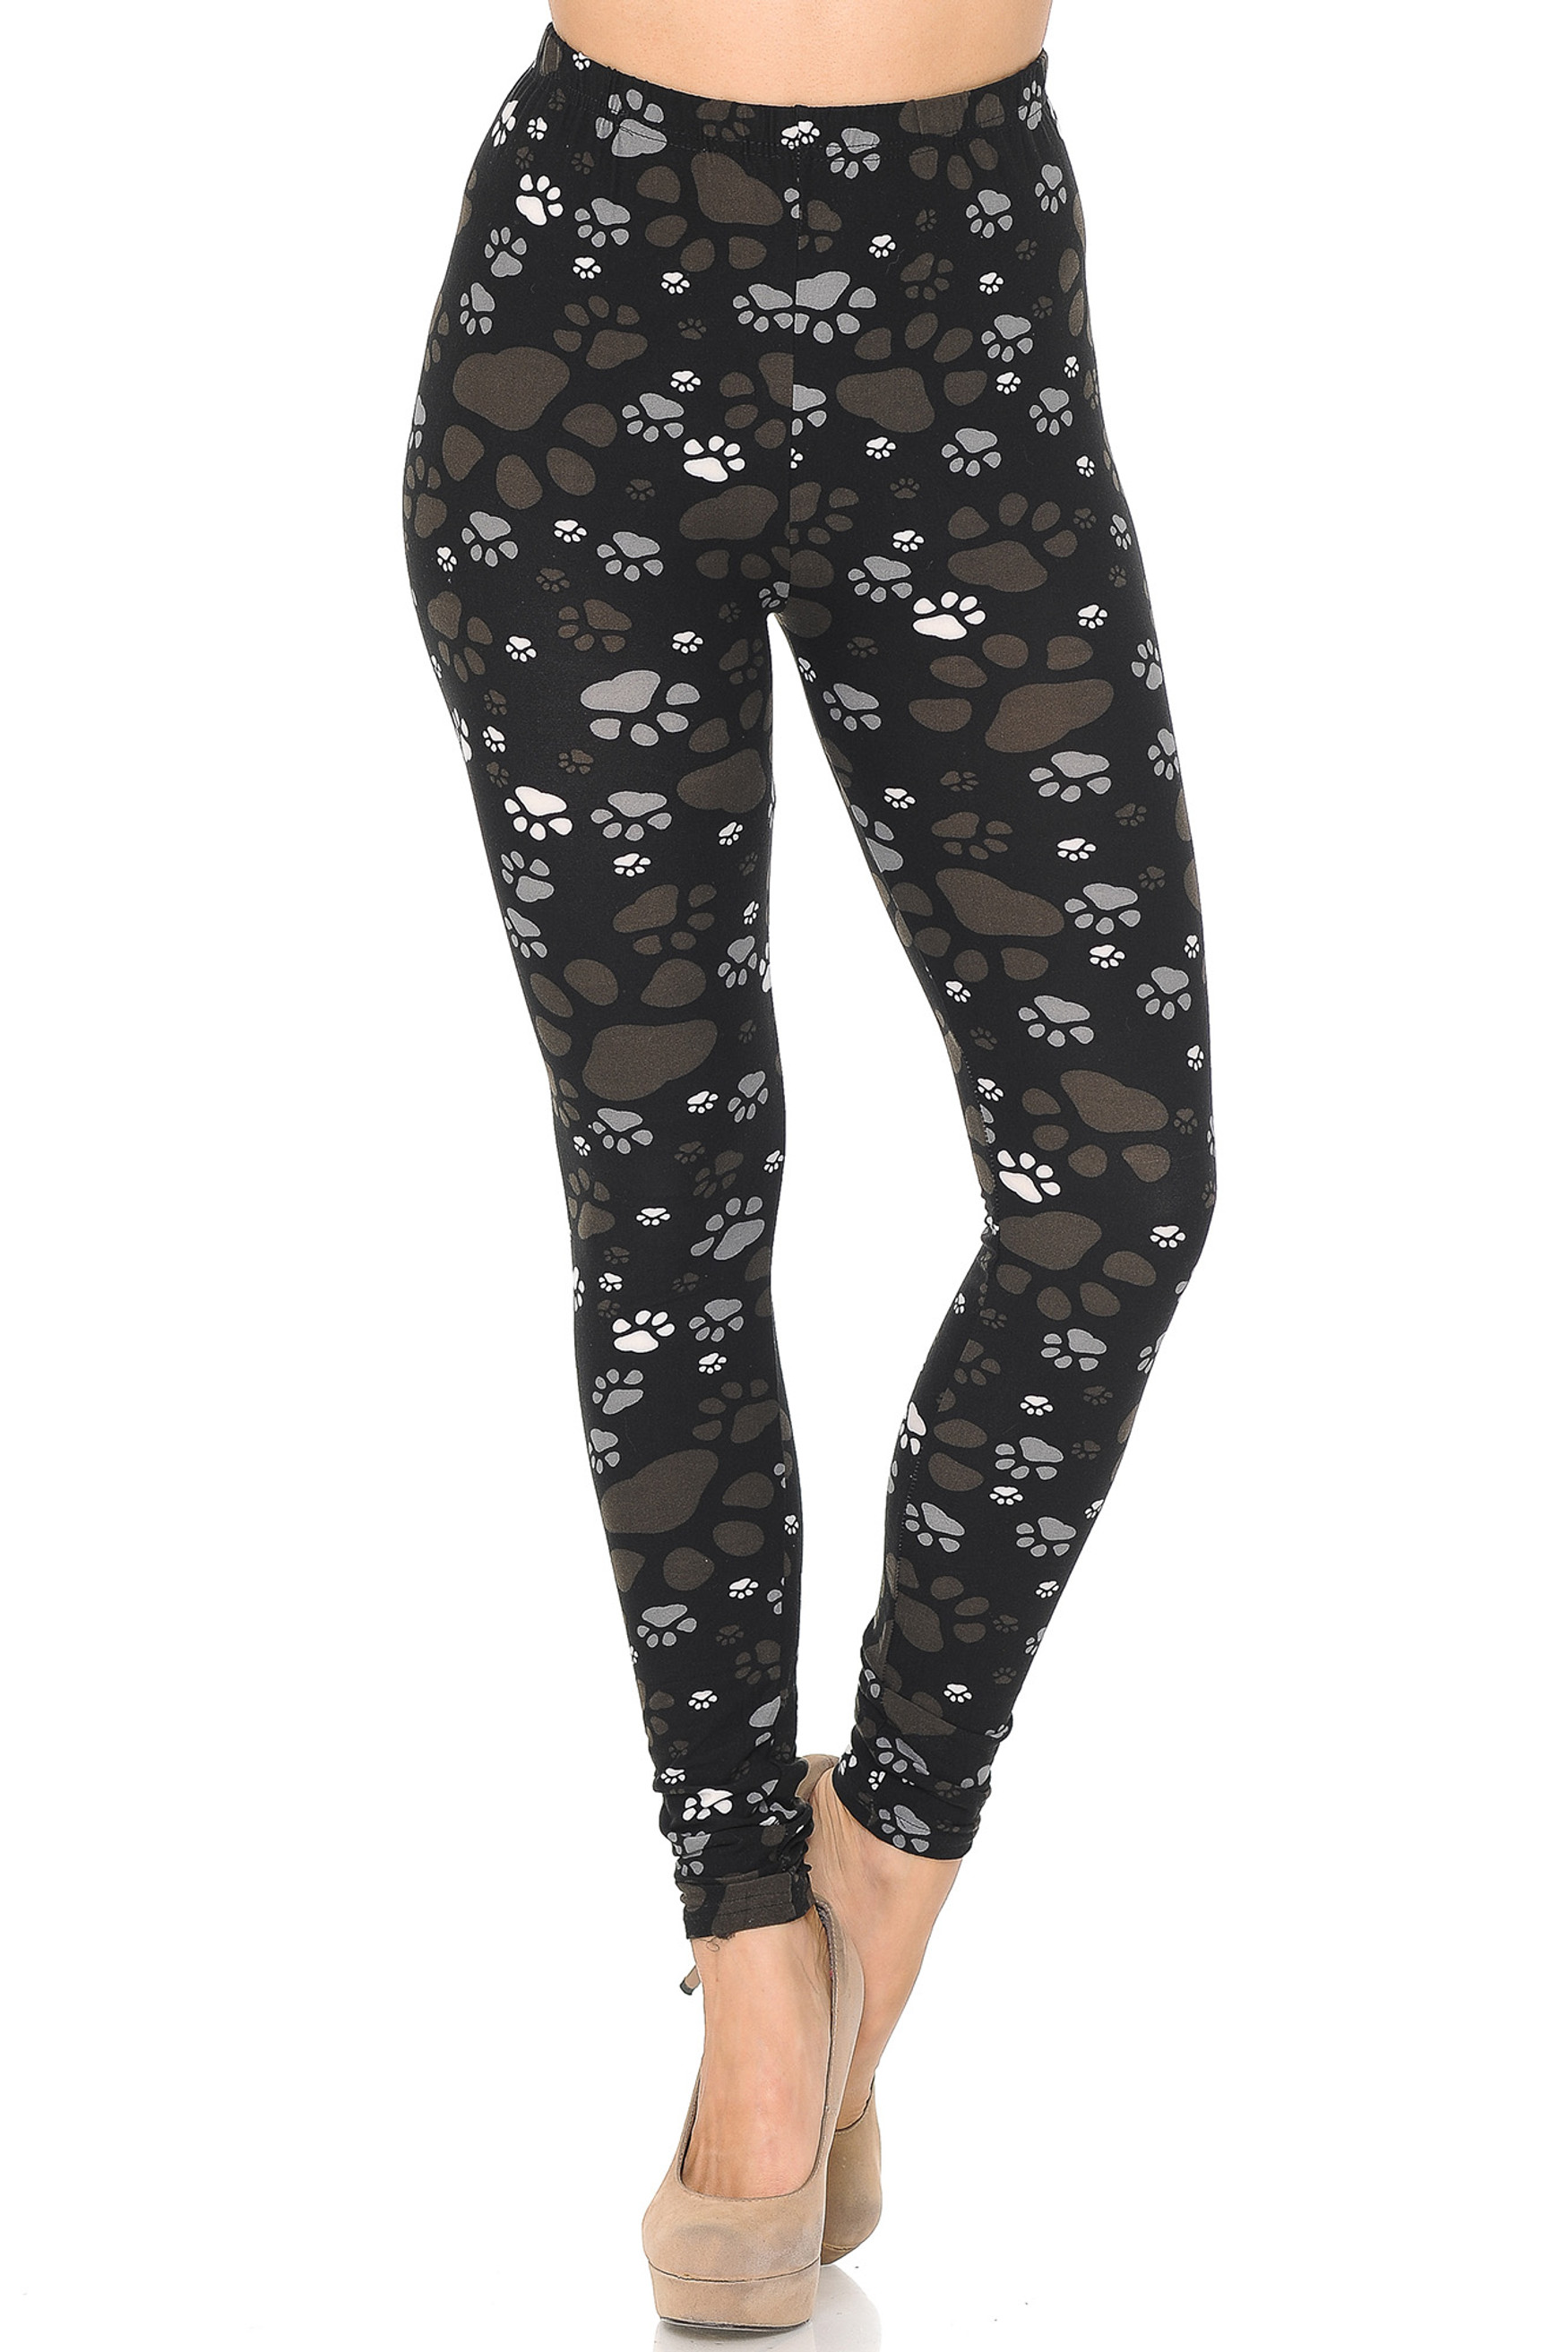 Front of Creamy Soft Muddy Paw Print Leggings  - USA Fashion™